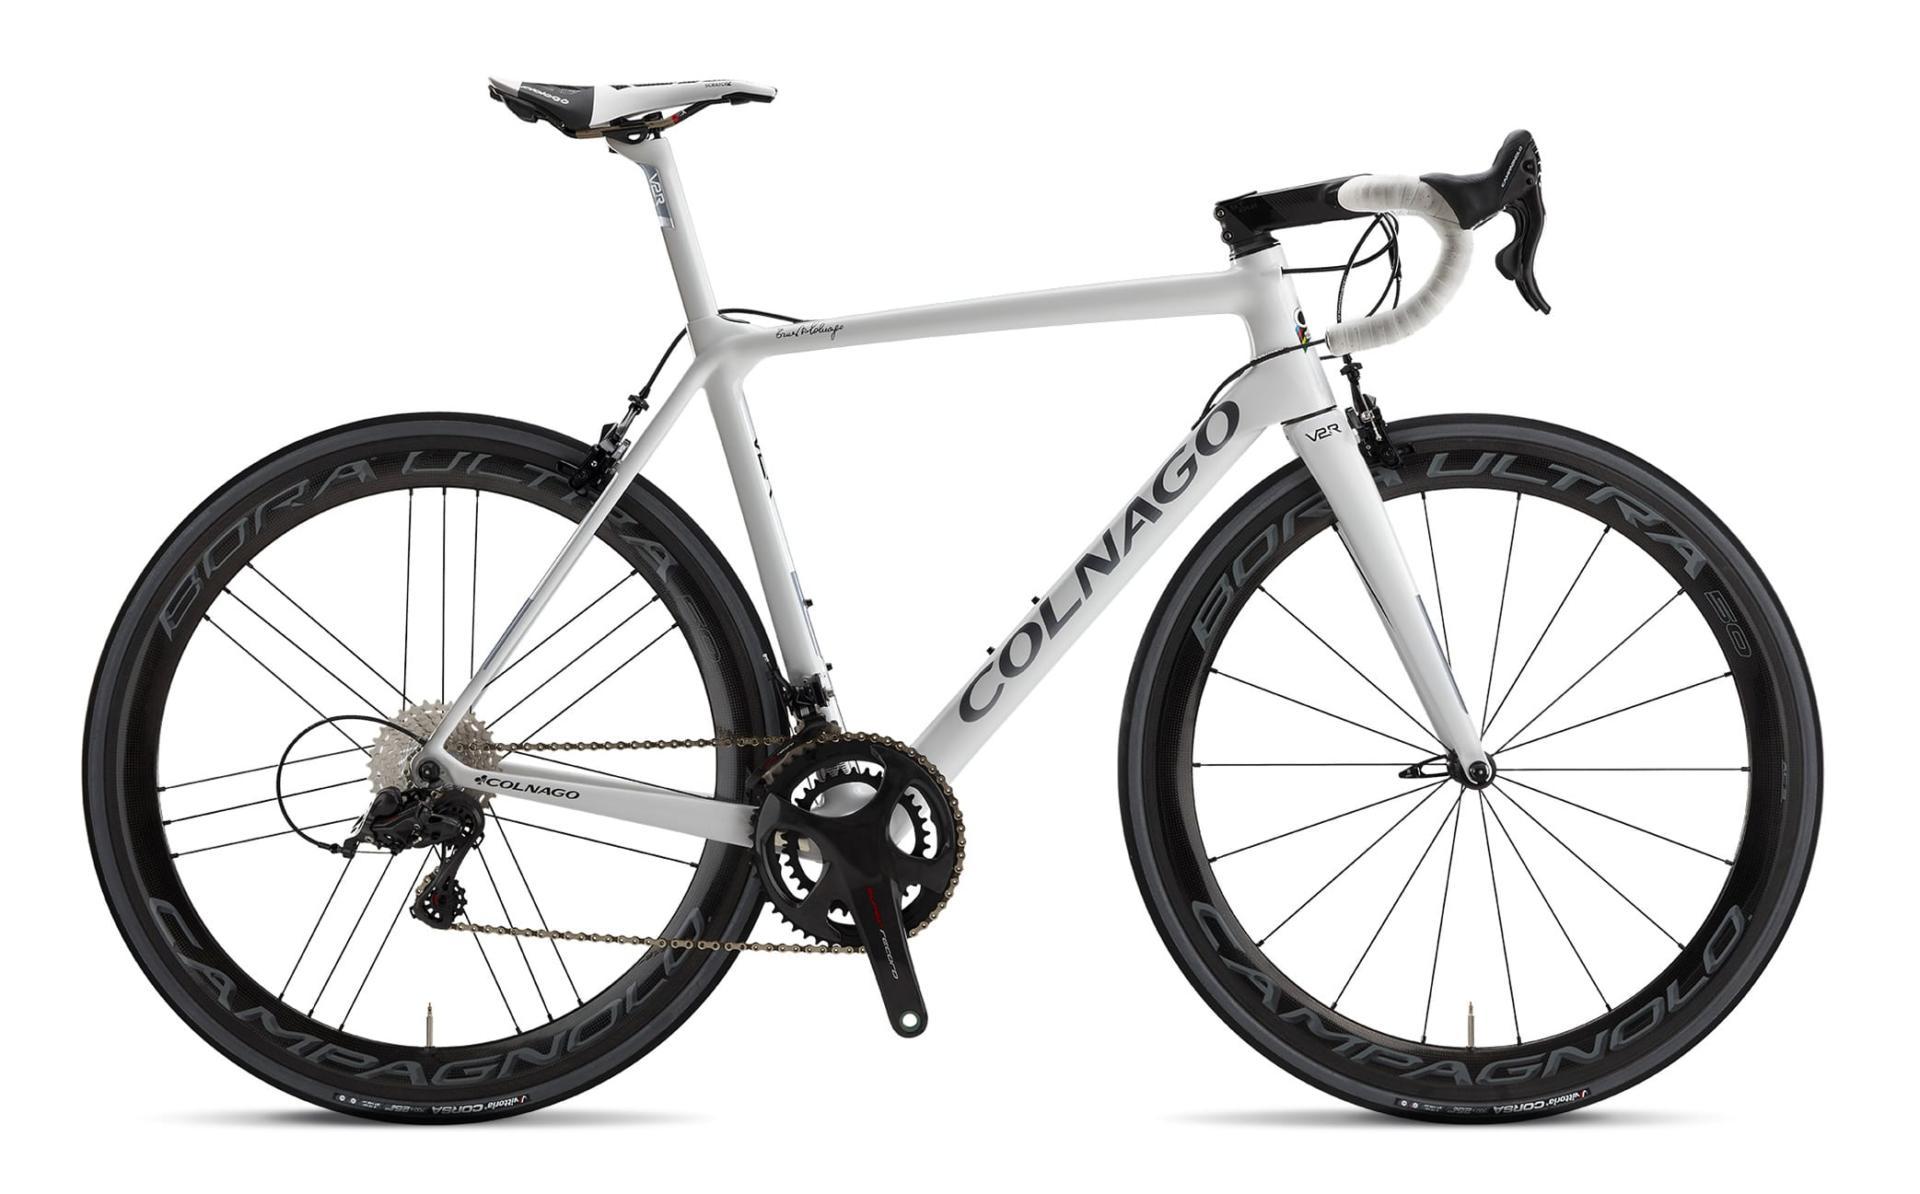 Colnago-V2R-All-Bikes-Putte-Ludwig-Wynants-racefietsen-elektrische-fietsen-mountainbikes-koersfiets-kopen-herstellingen